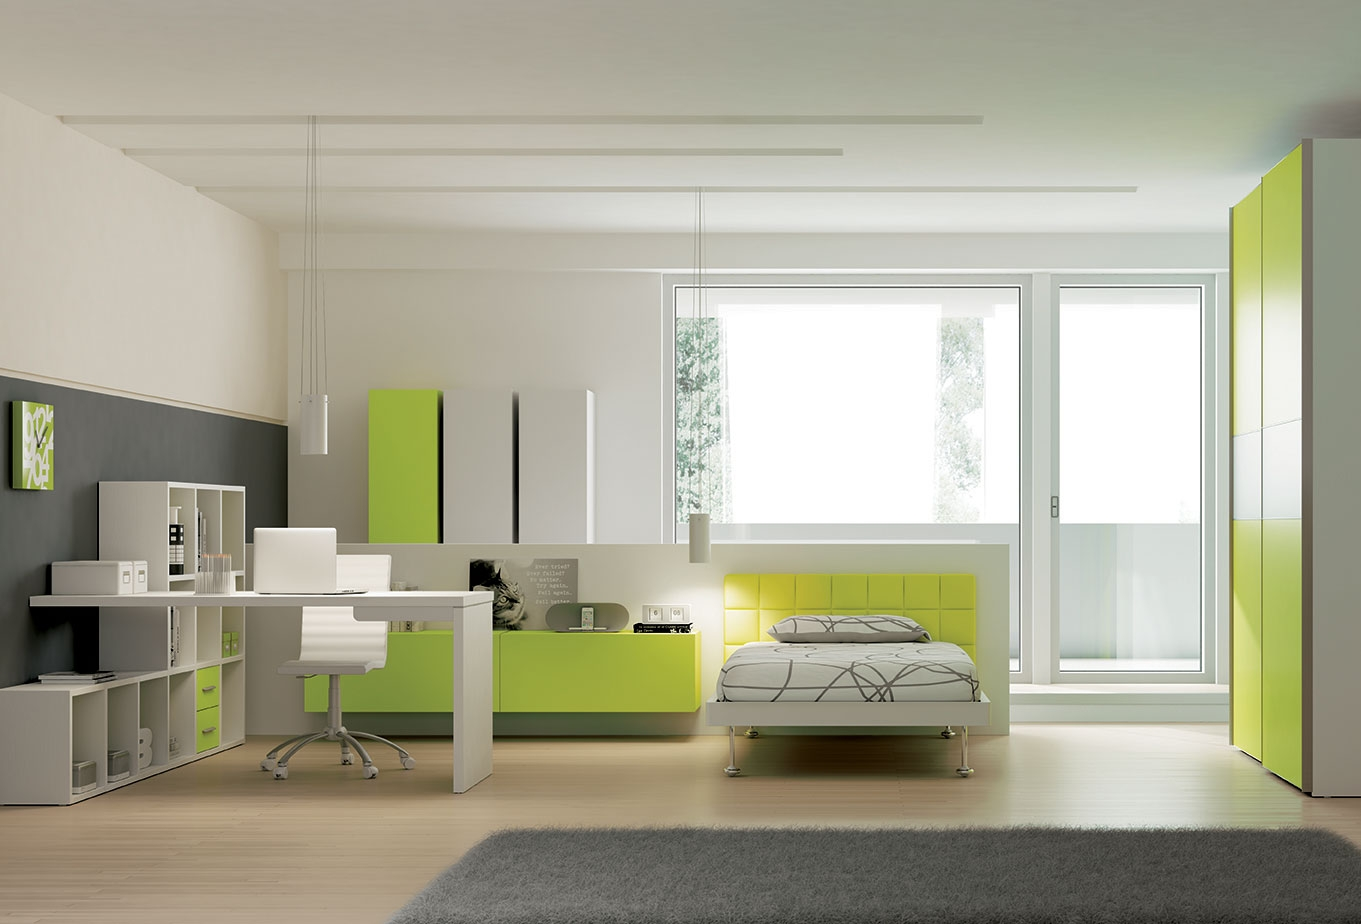 Chambre ado PERSONNALISABLE YC30 lit 1 personne - MORETTI COMPACT